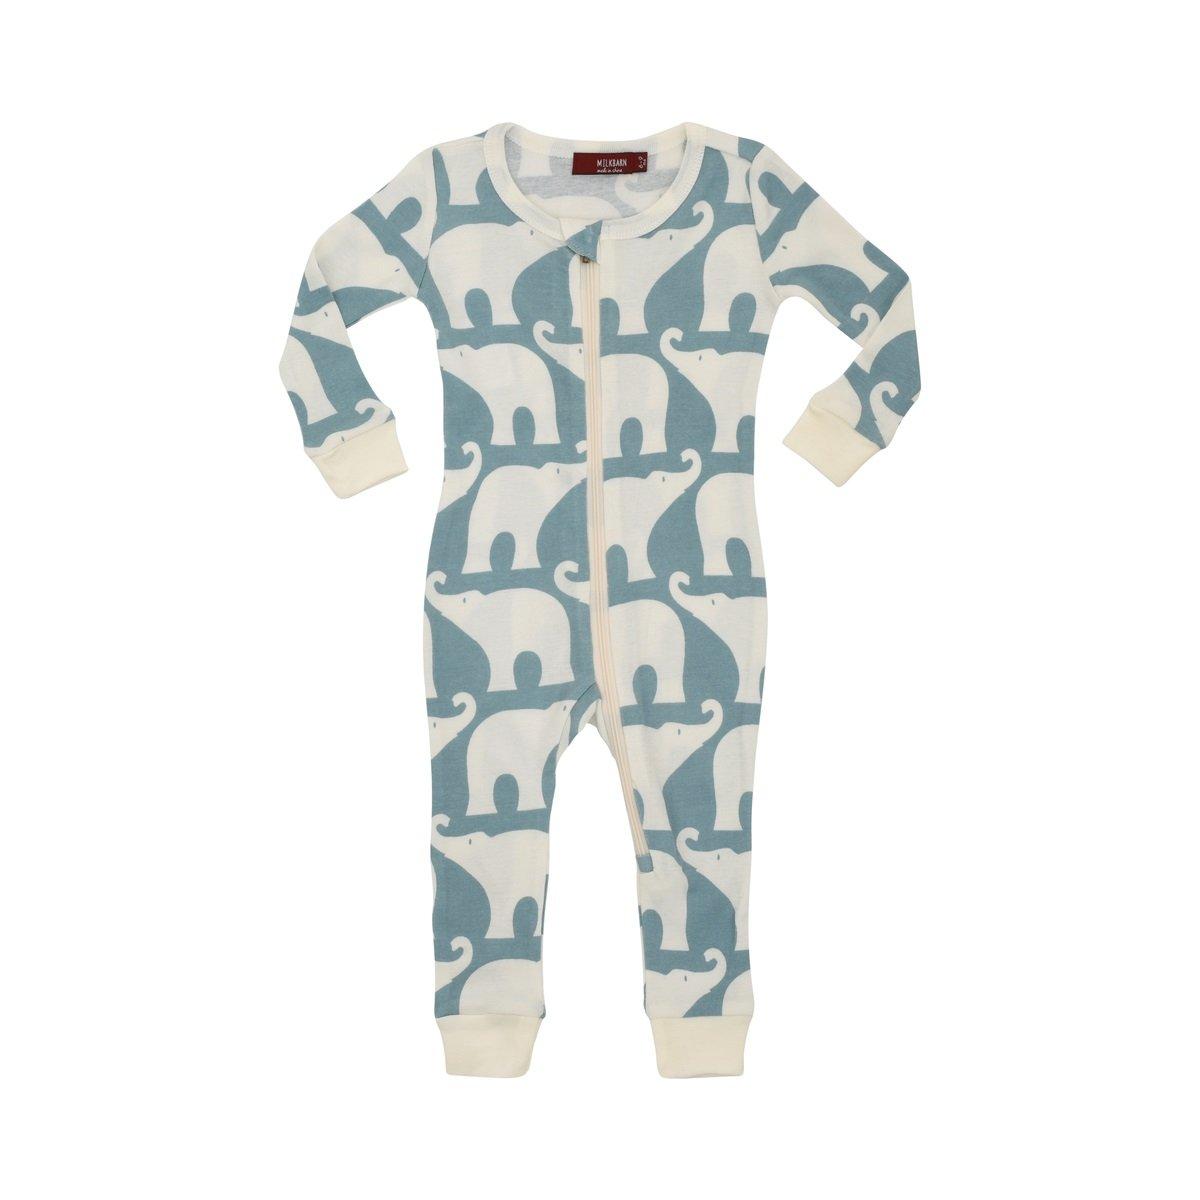 MilkBarn Organic Cotton Zipper Pajama - Blue Elephant (6-9 Months) by MilkBarn